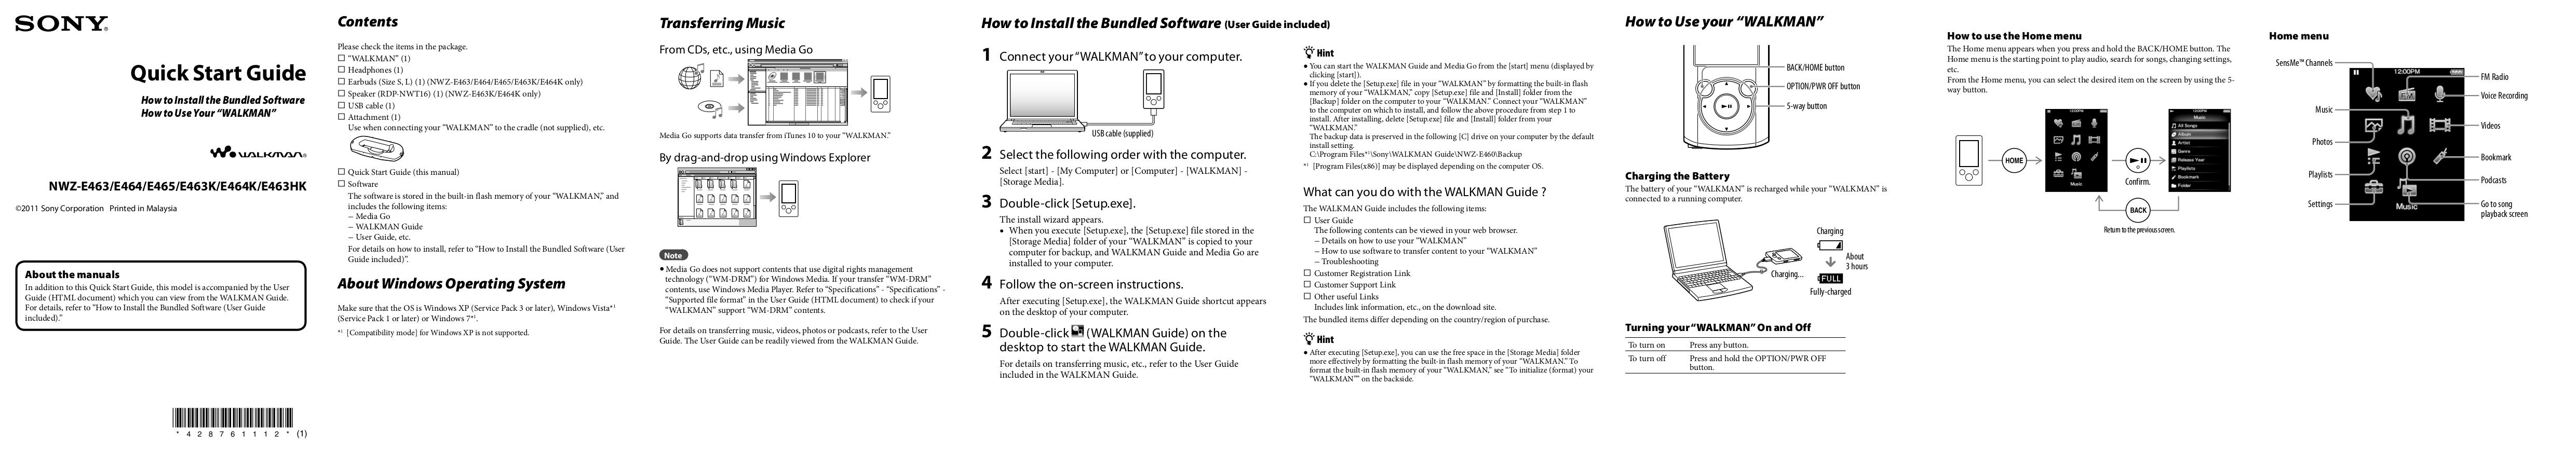 download free pdf for sony walkman nwz e464 mp3 player manual Sony Walkman Nwz- A15 sony walkman digital media player nwz-e464 manual